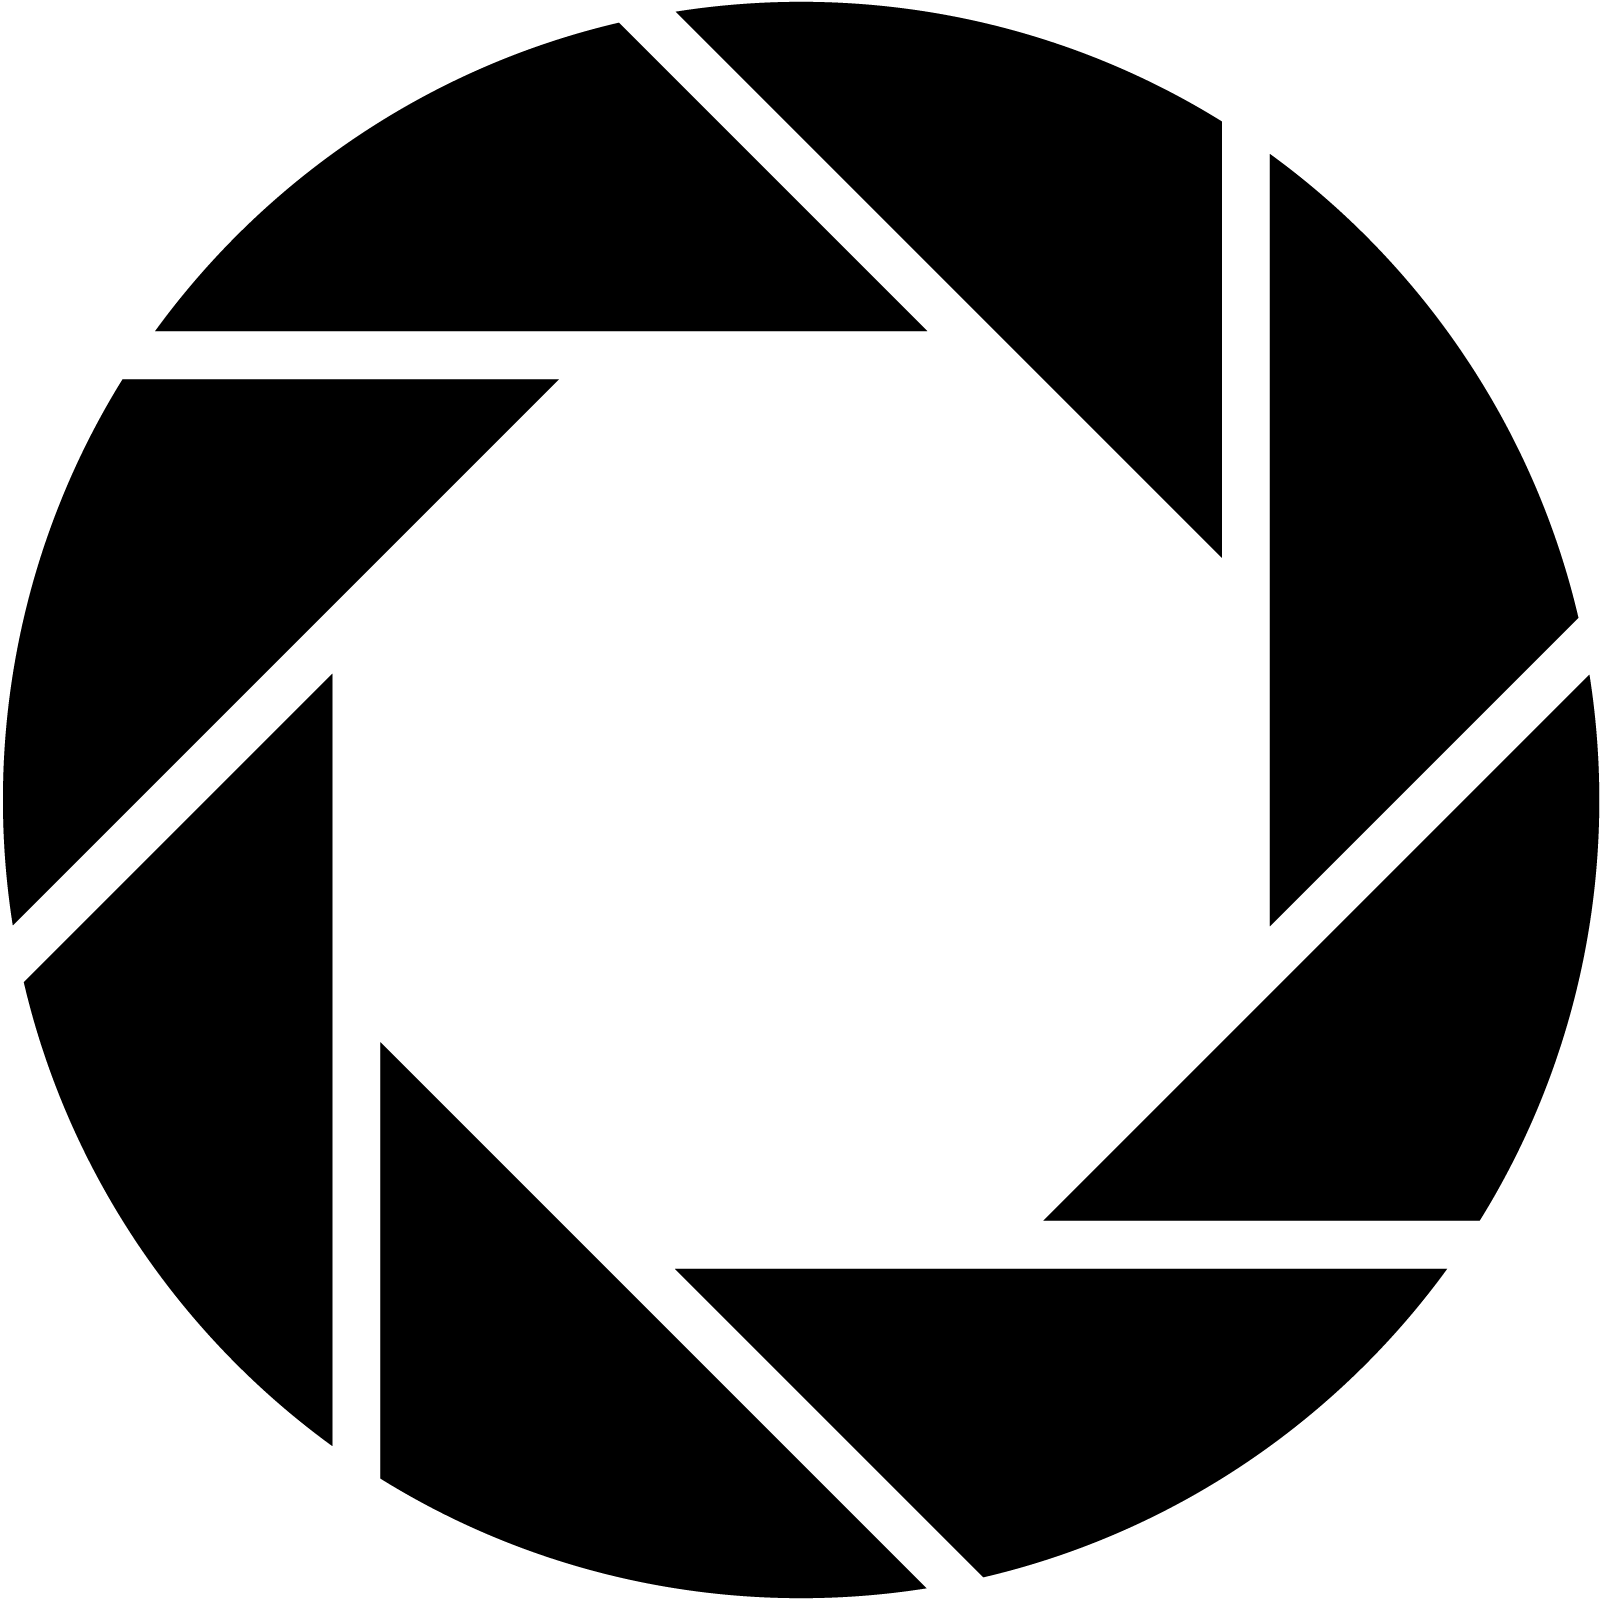 Camera Aperture Symbol